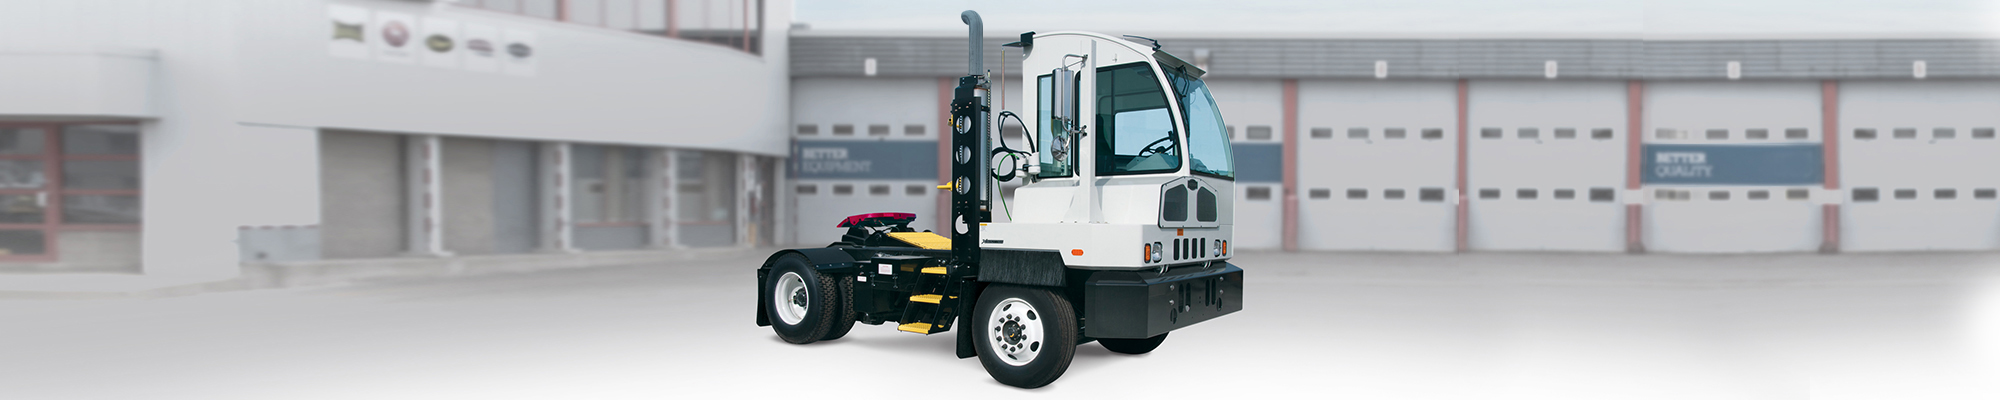 Autocar Shunt Trucks and Yard Trucks